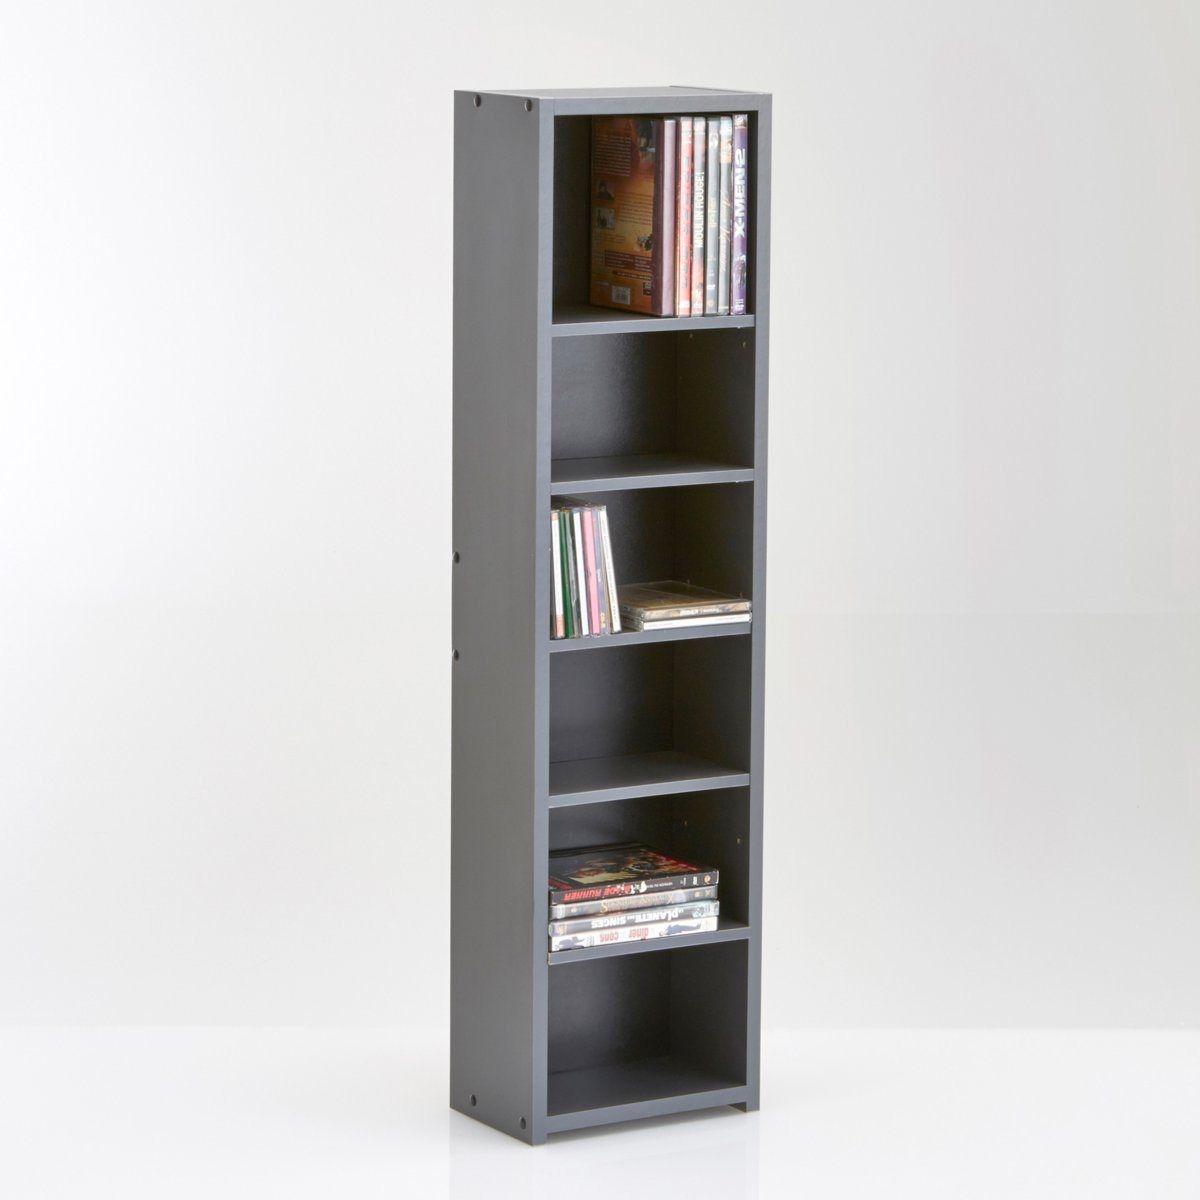 vente etagere biblioth que et tag re tritoo maison et jardin. Black Bedroom Furniture Sets. Home Design Ideas